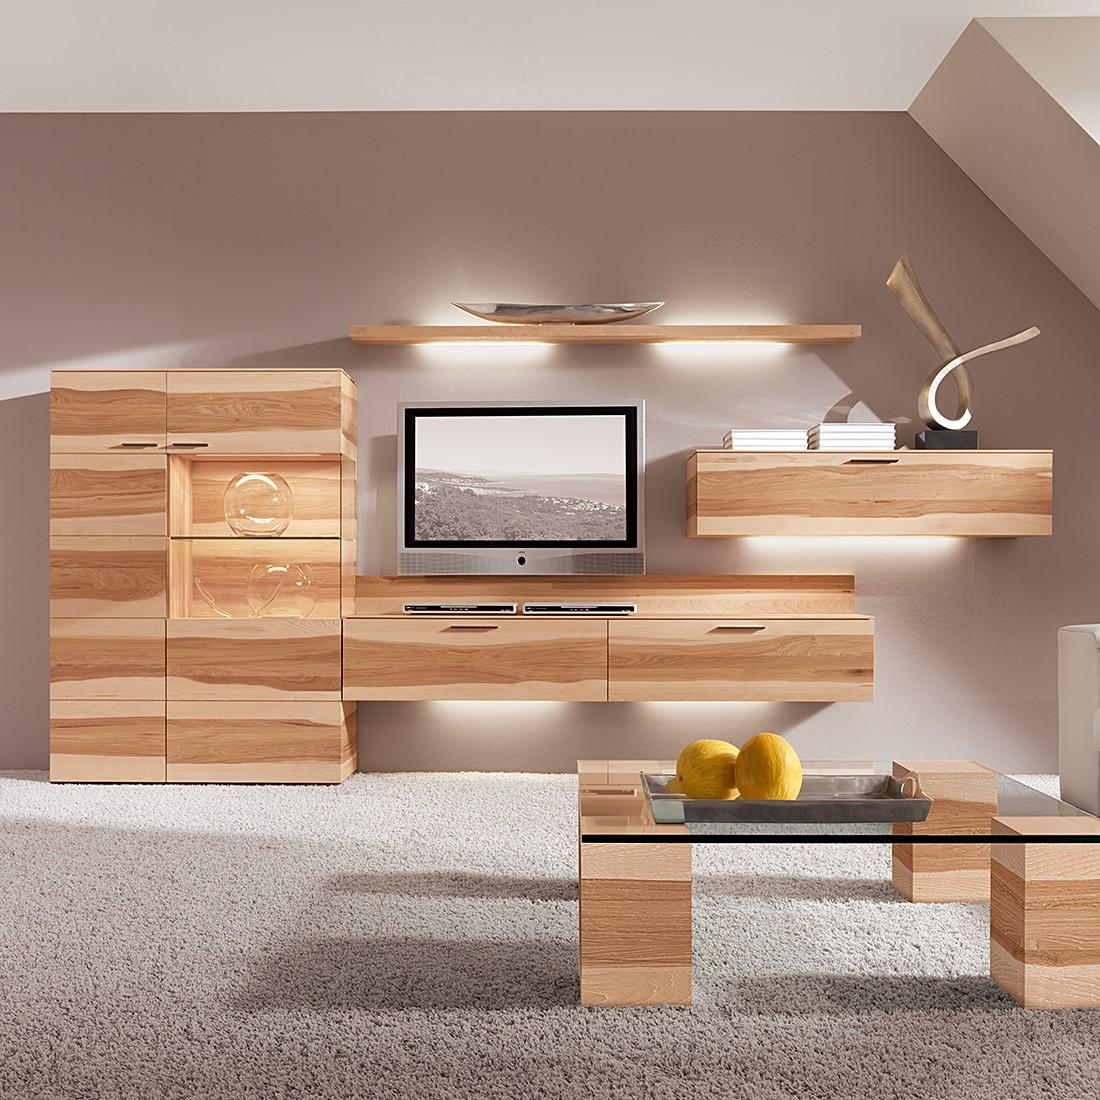 eek a wohnwand pecano ii 4 teilig pecan nuss massiv mit beleuchtung hartmann g nstig kaufen. Black Bedroom Furniture Sets. Home Design Ideas